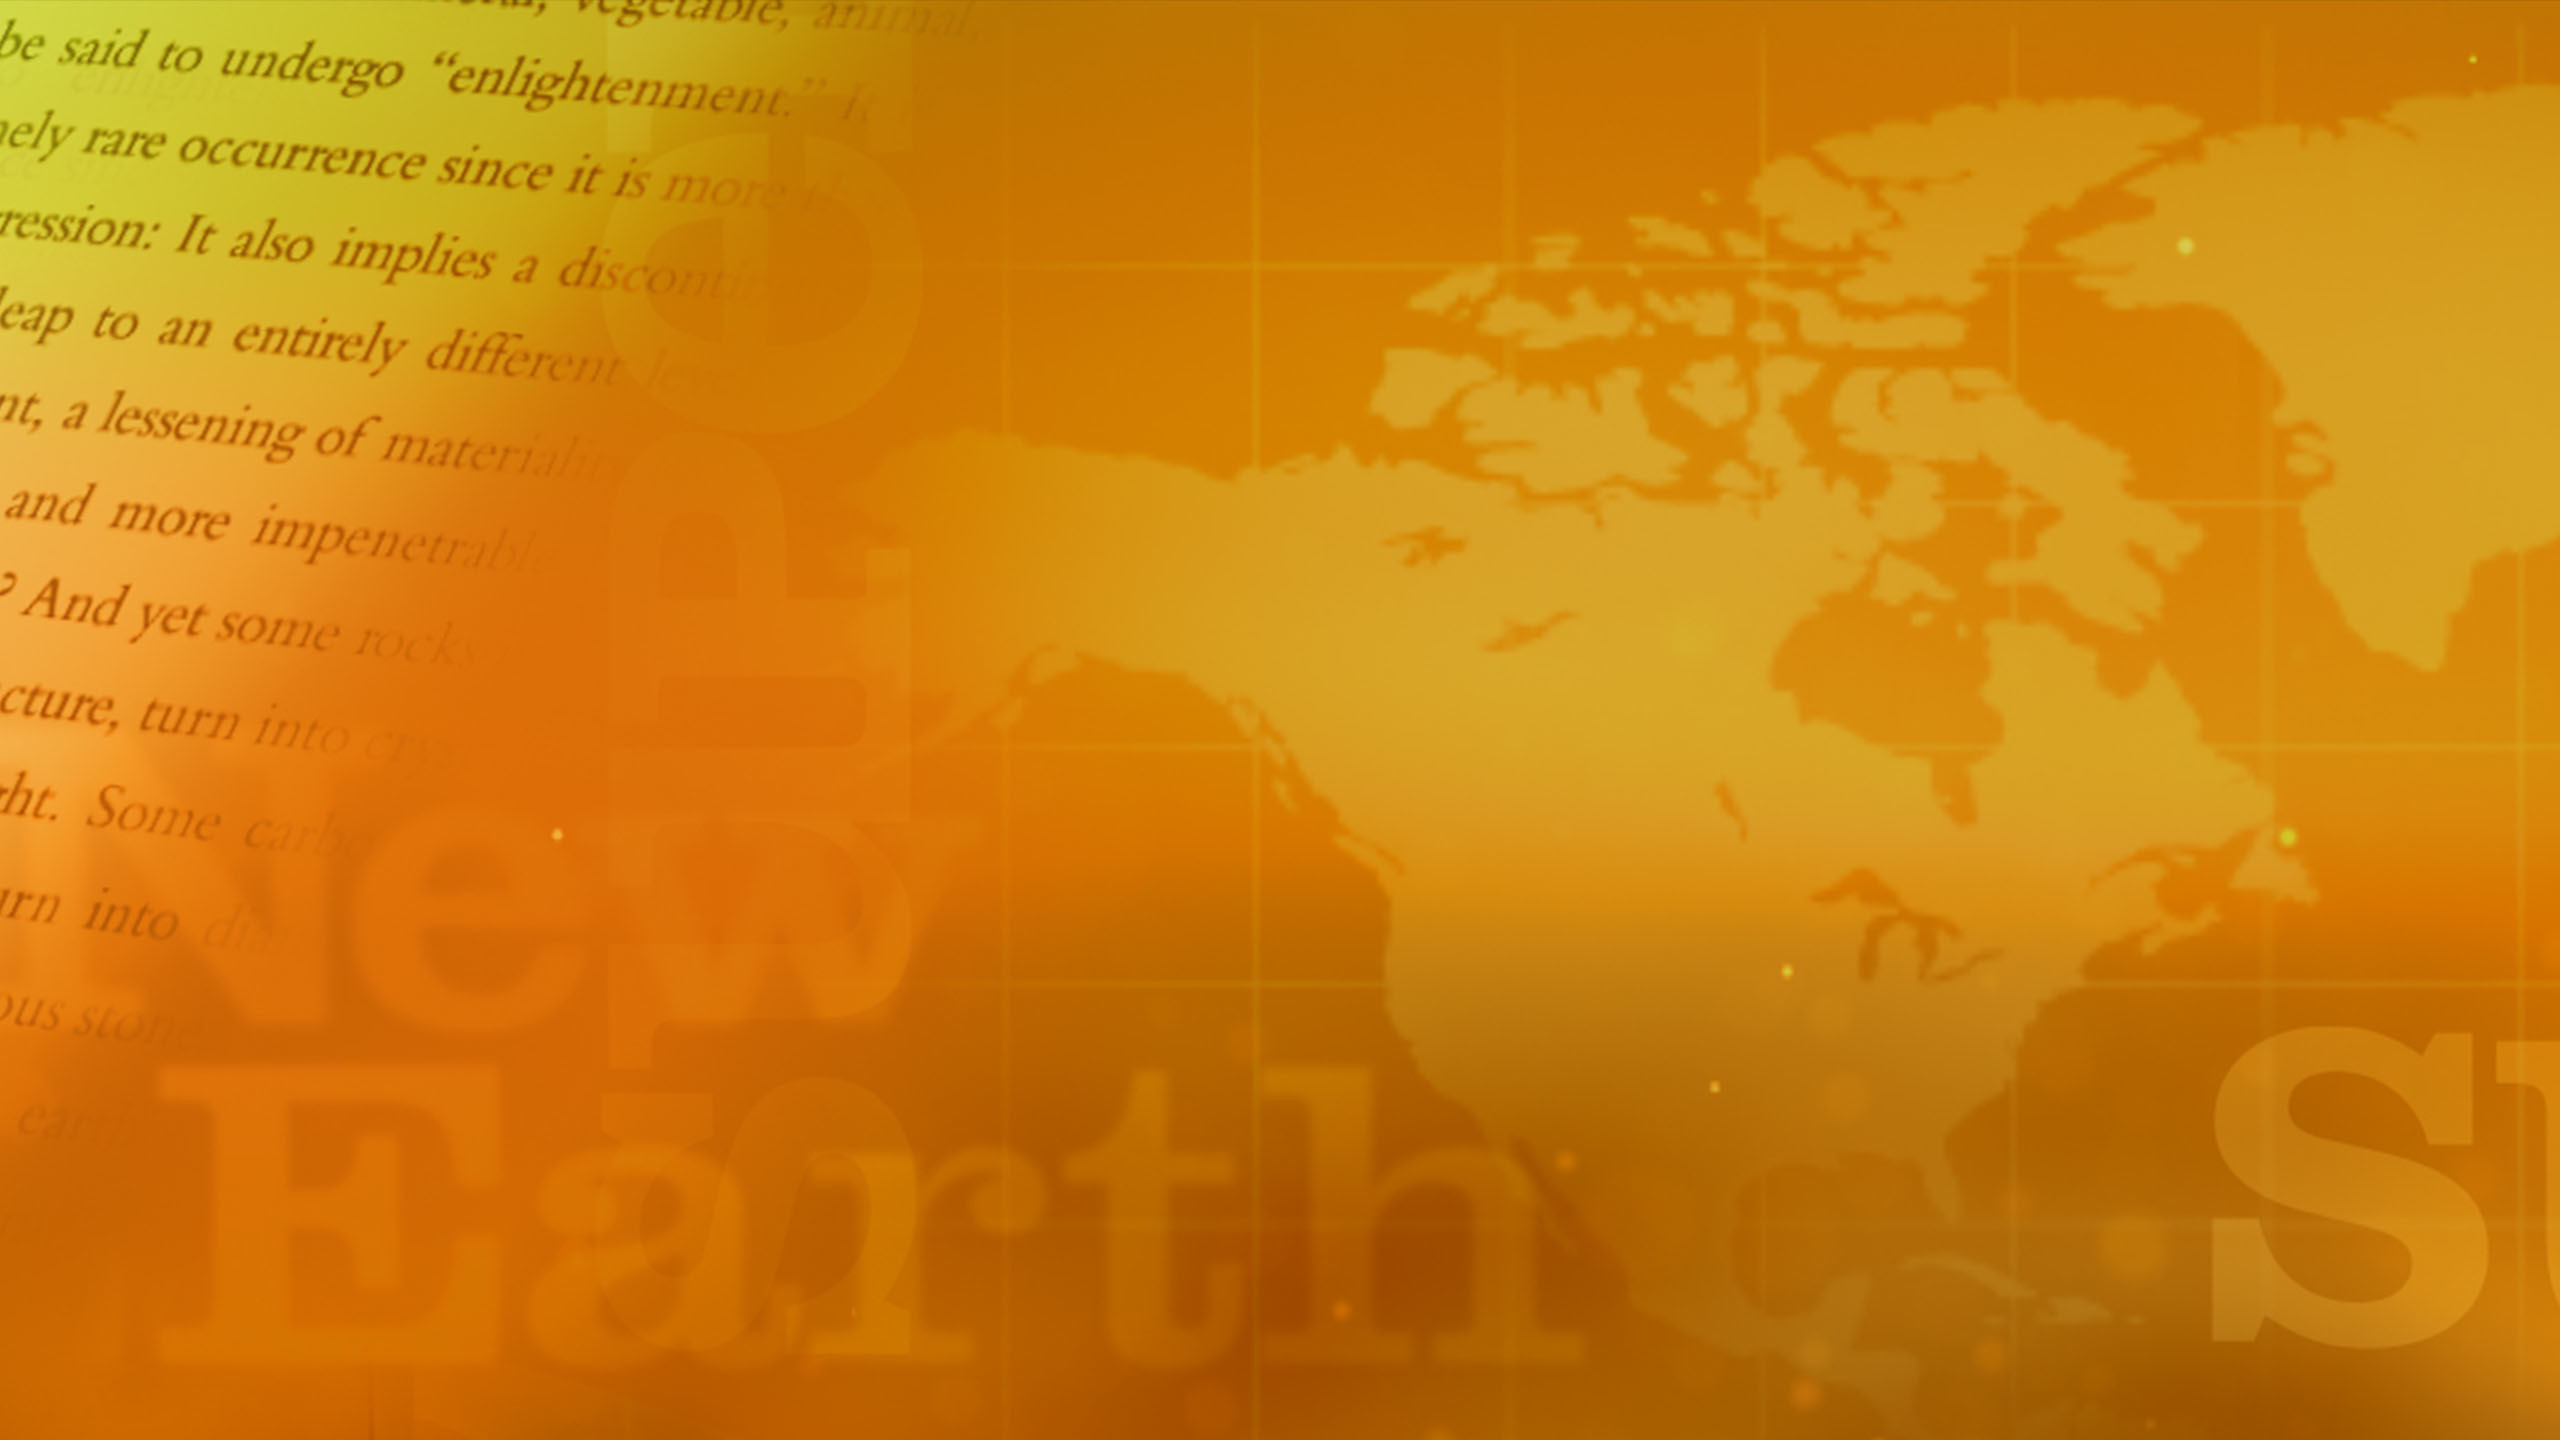 Sweepstakes oprah winfrey network schedule